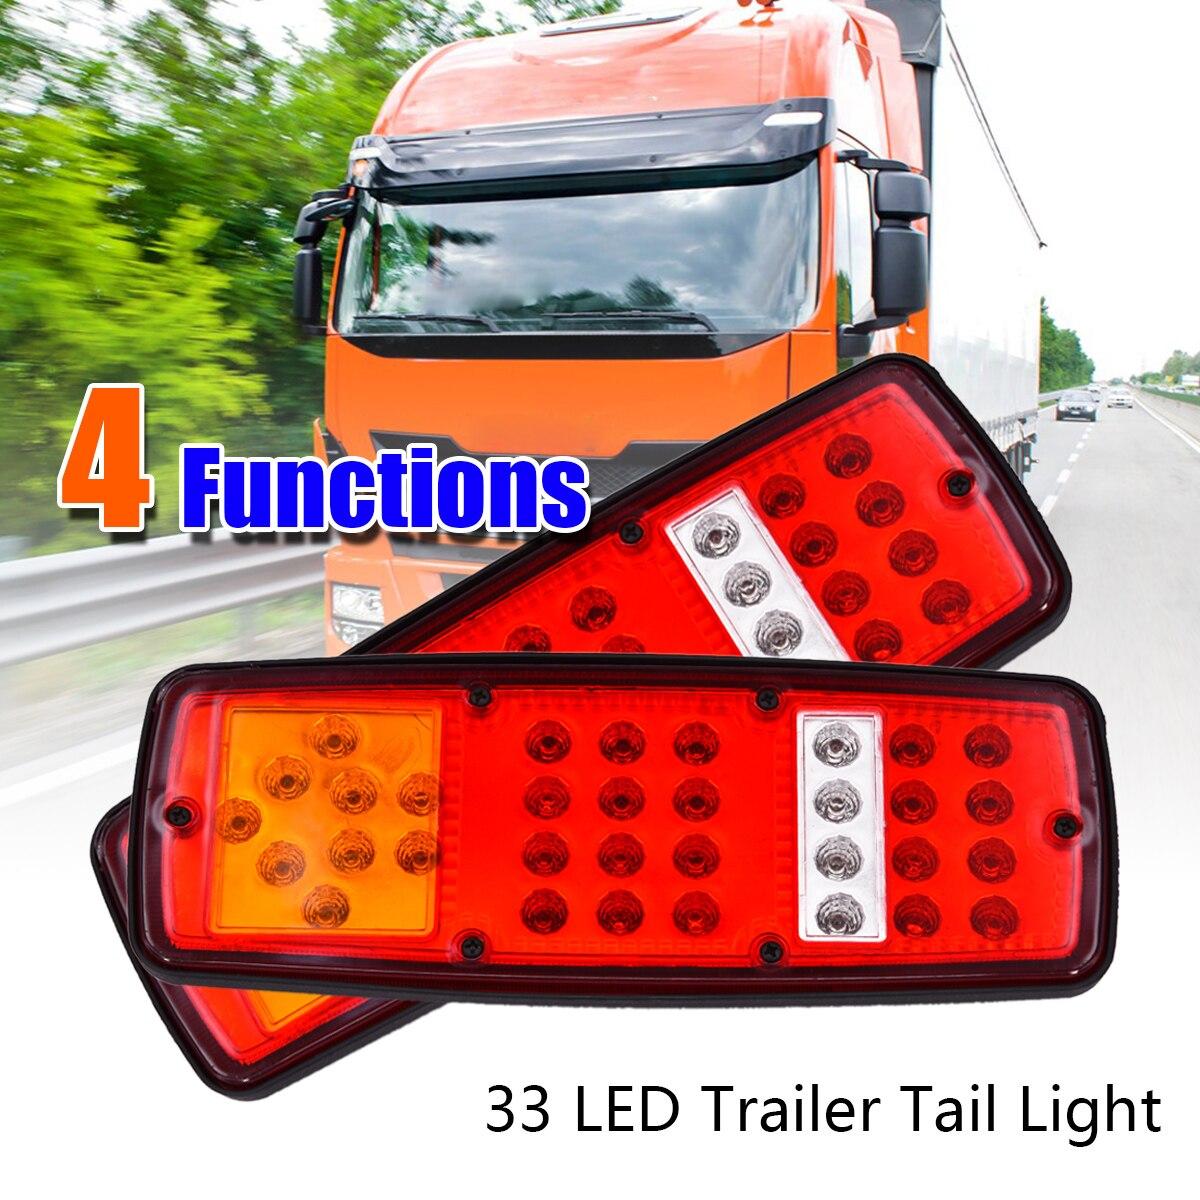 2x 12V Truck Trailer Boat 33 LED Lamp Kit Tail Light Stop Indicator Waterproof